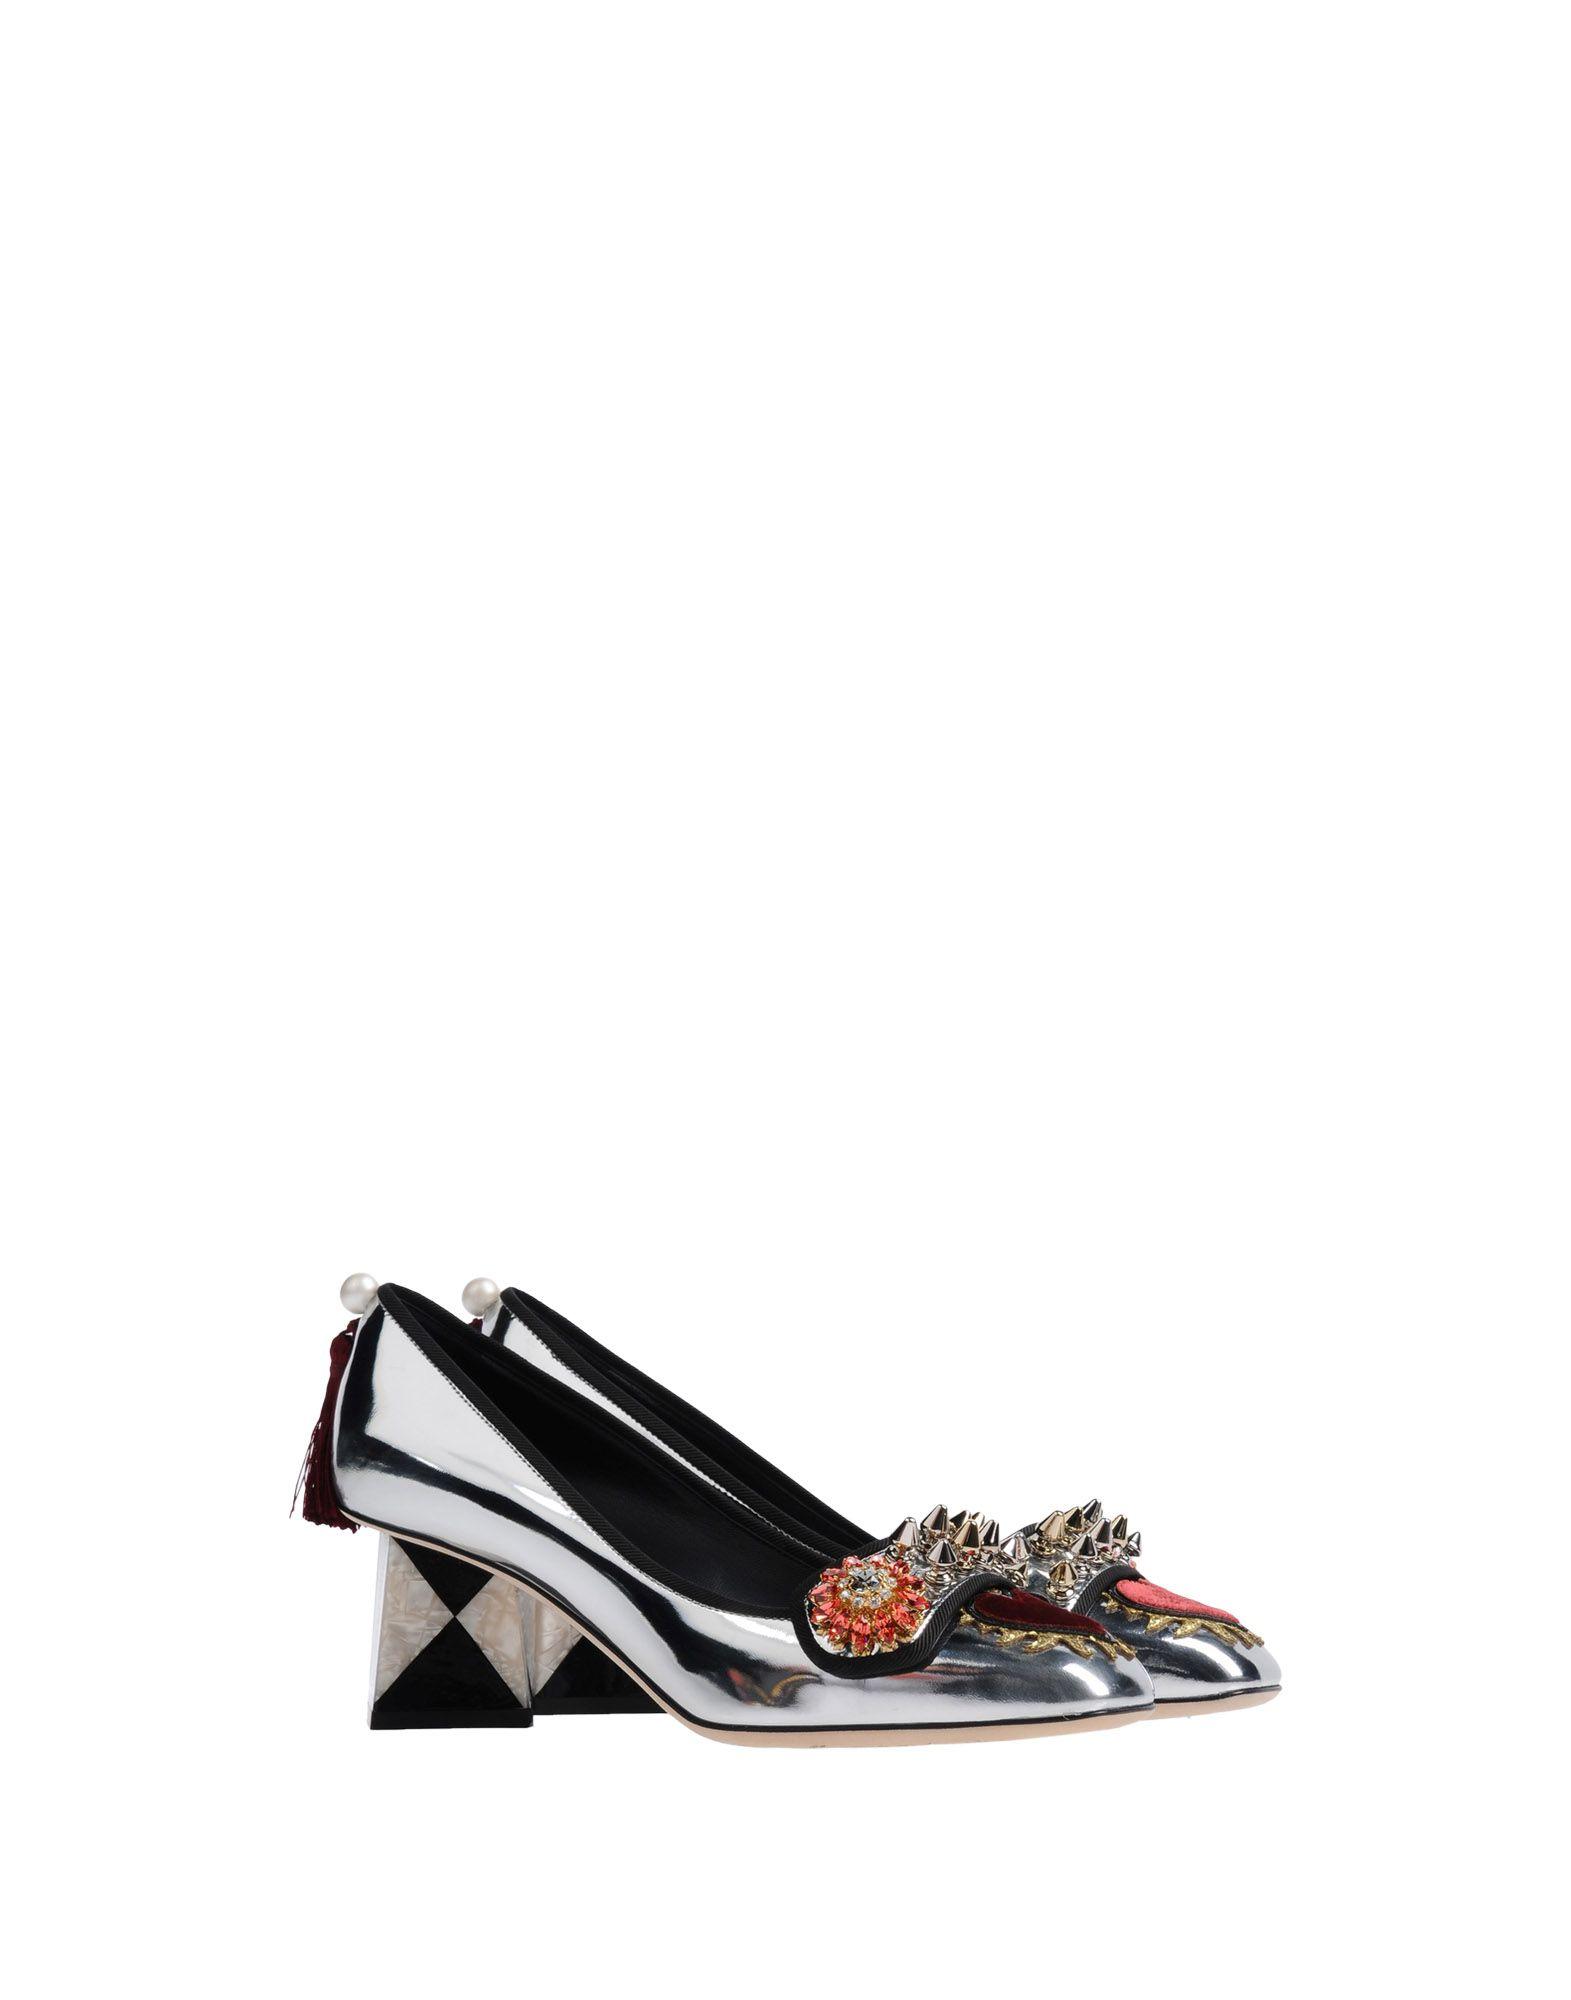 Dolce & Gabbana Pumps Damen  11449186BK Neue Schuhe Schuhe Neue 8516a6